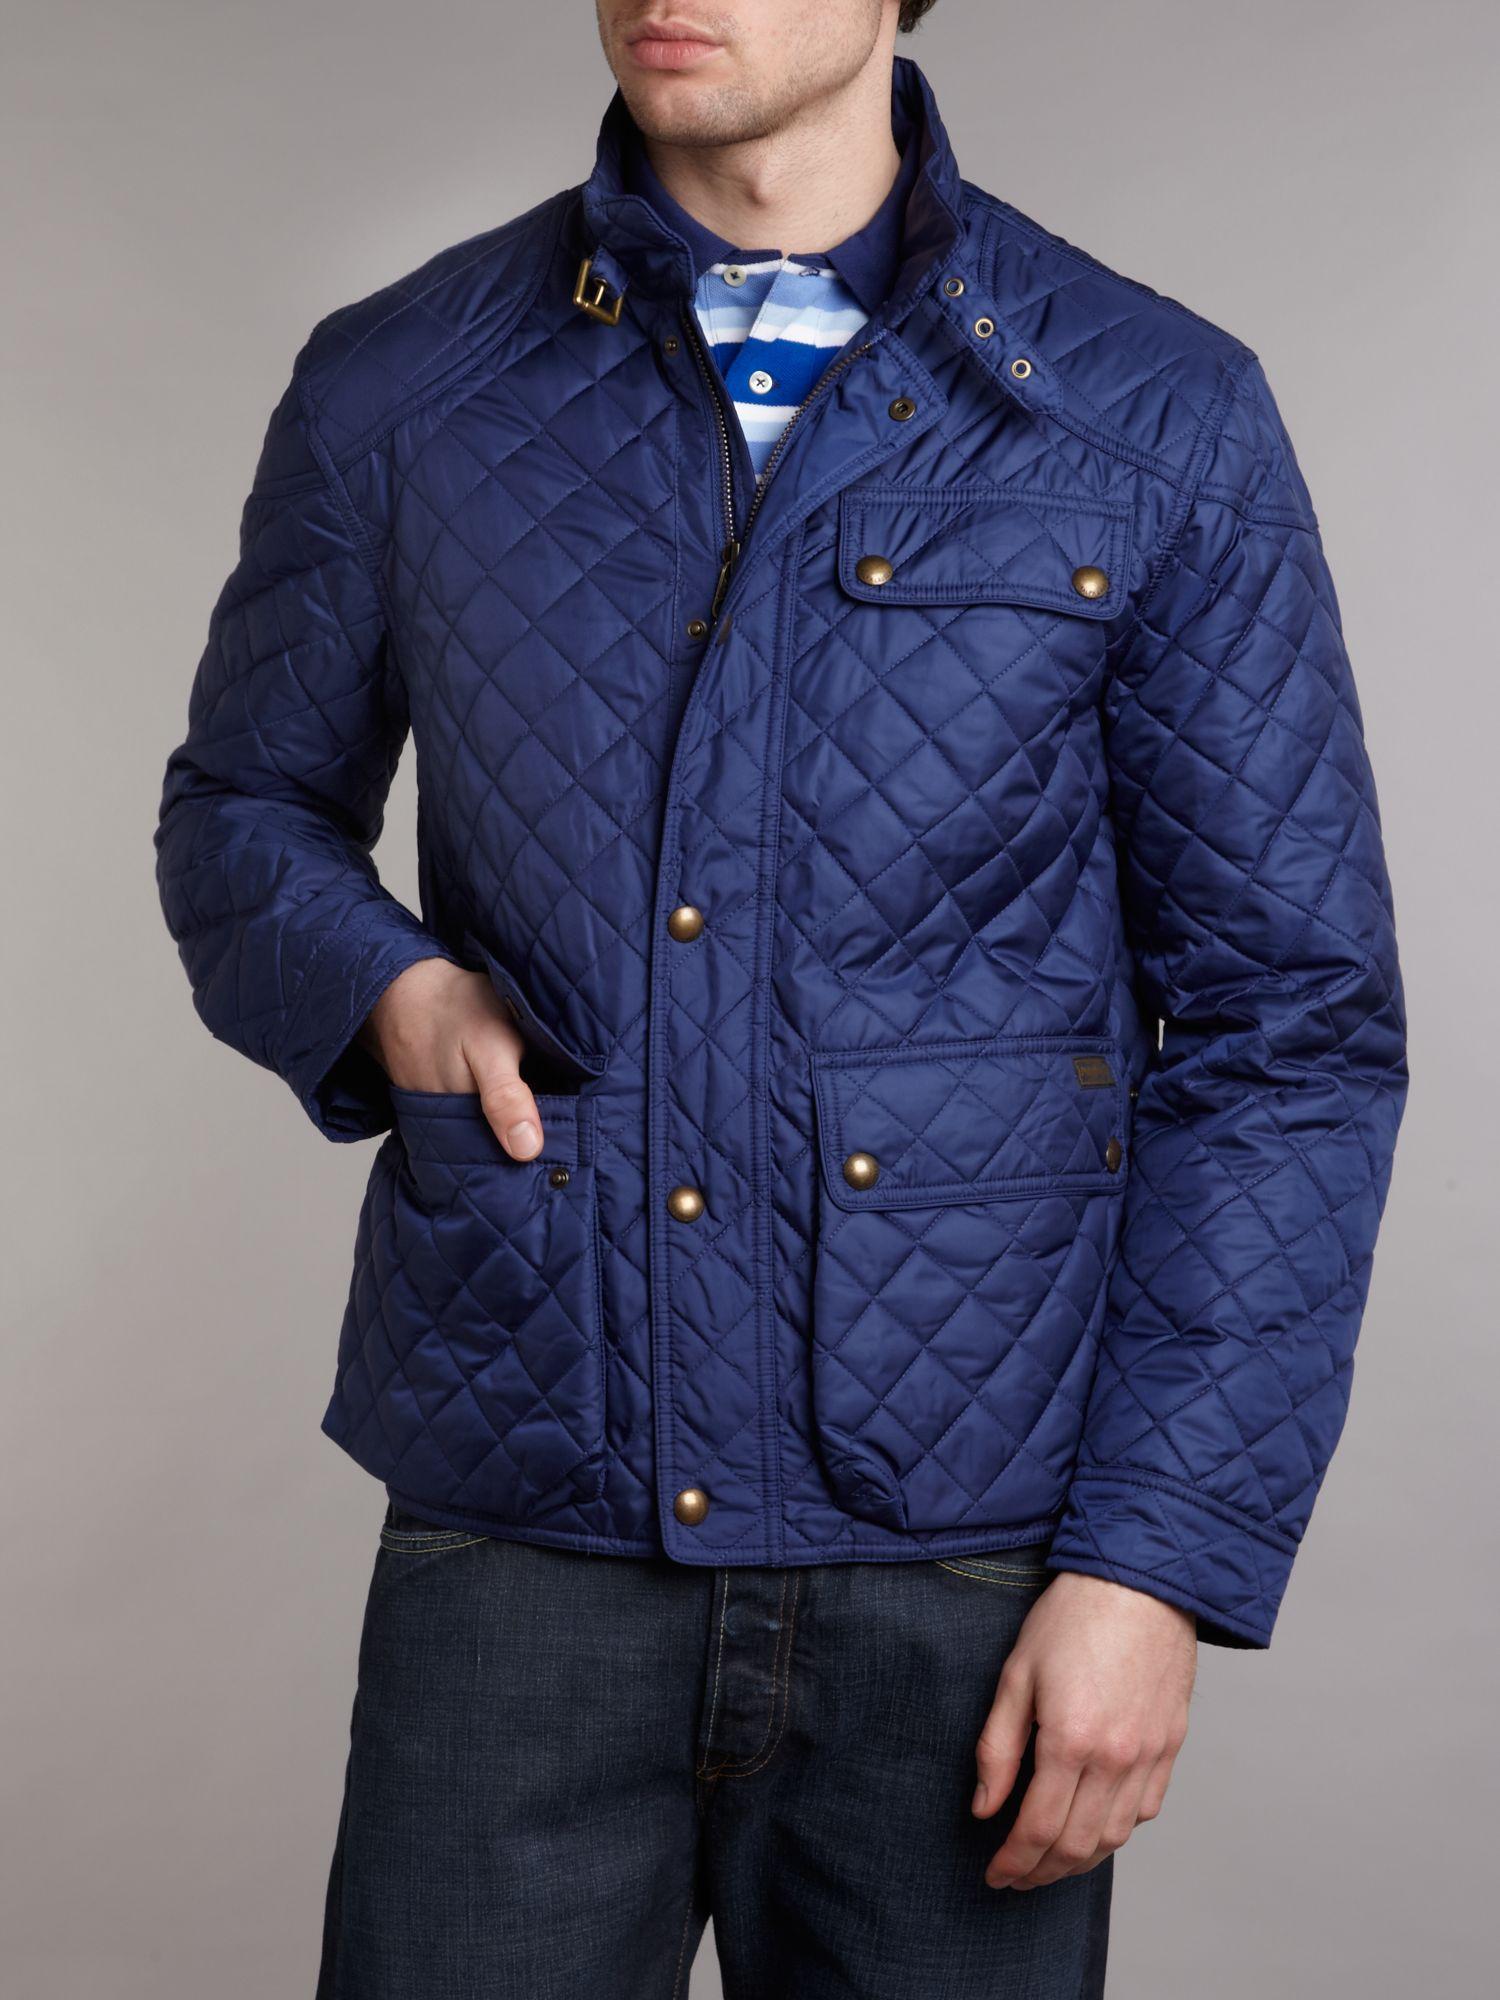 polo ralph lauren quilted jacket in blue for men lyst. Black Bedroom Furniture Sets. Home Design Ideas